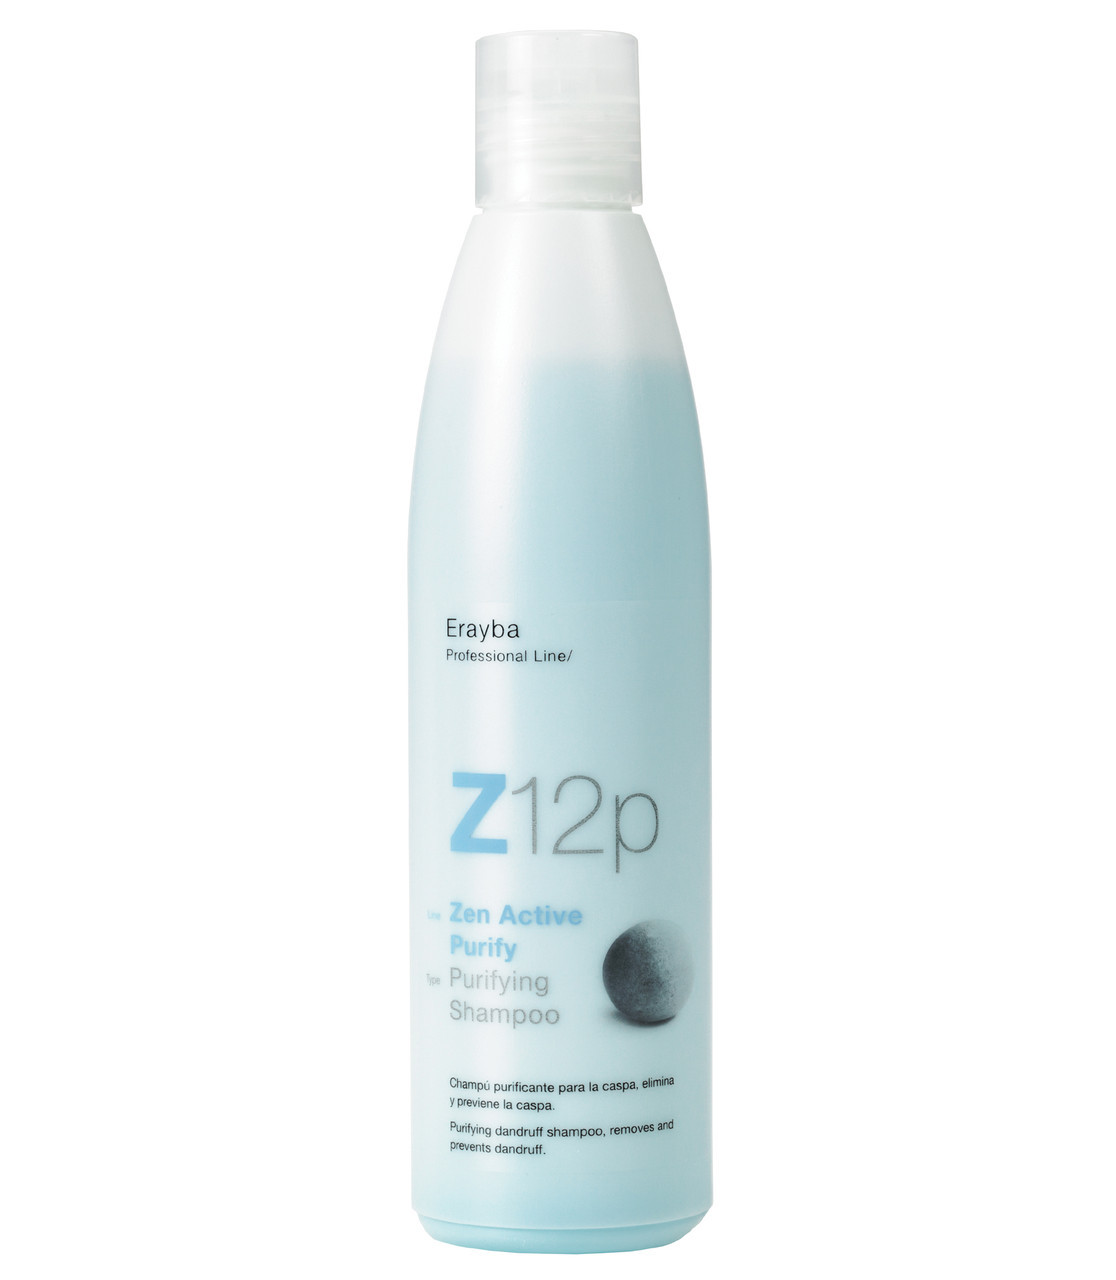 Erayba Z12p Purifying Shampoo Шампунь против перхоти 250 мл